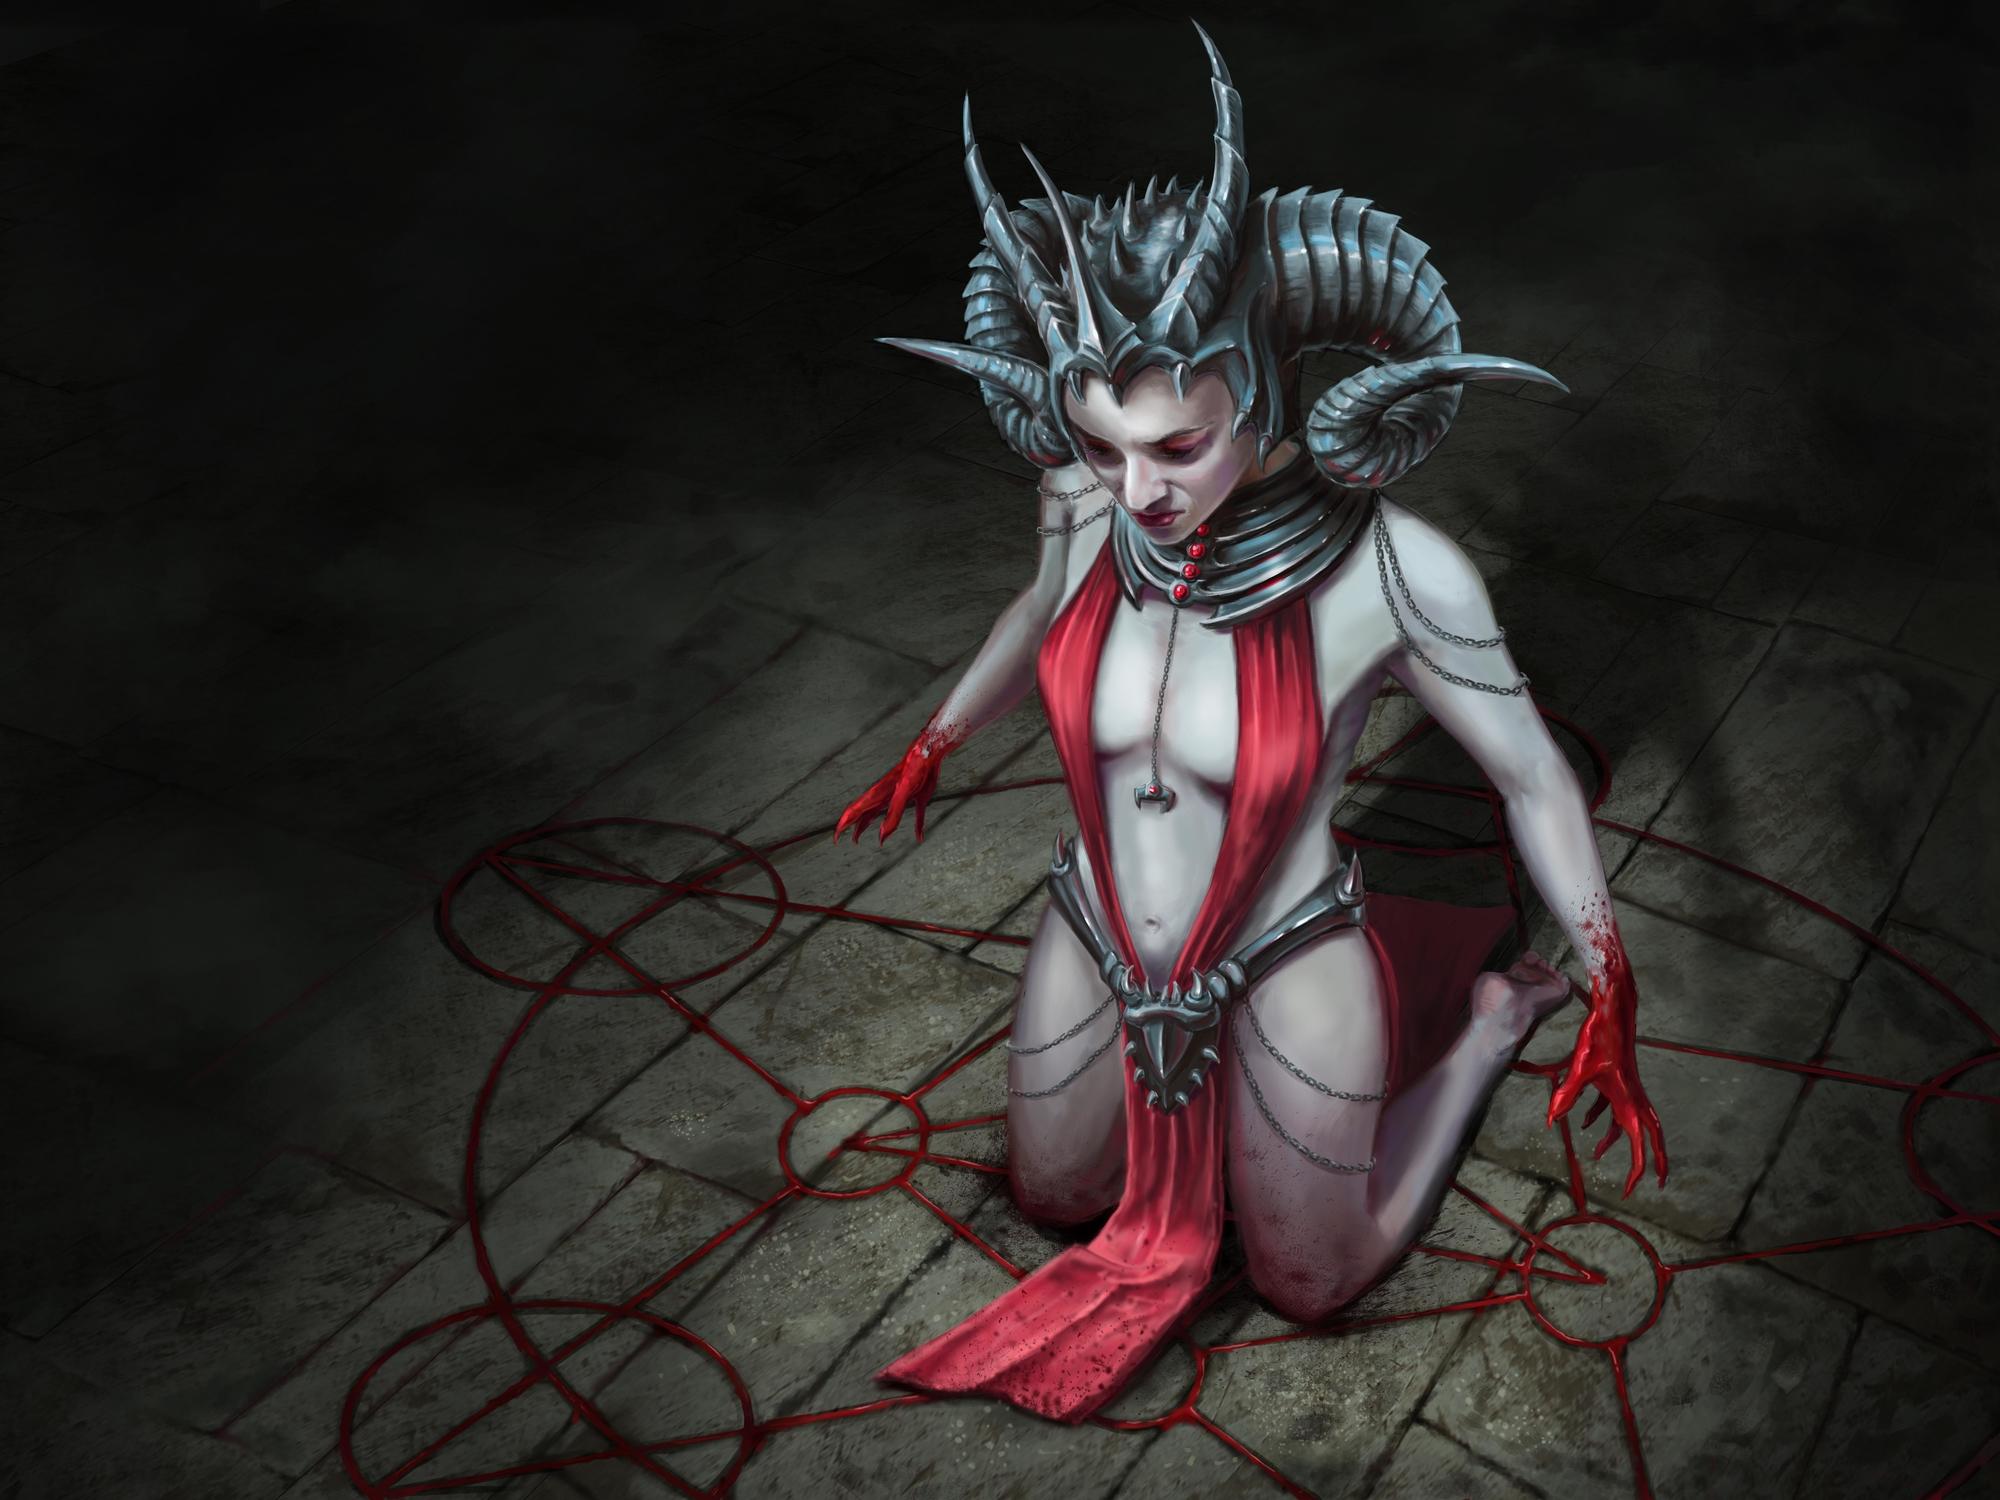 Dark Ritual Artwork by Elissa  Weaver